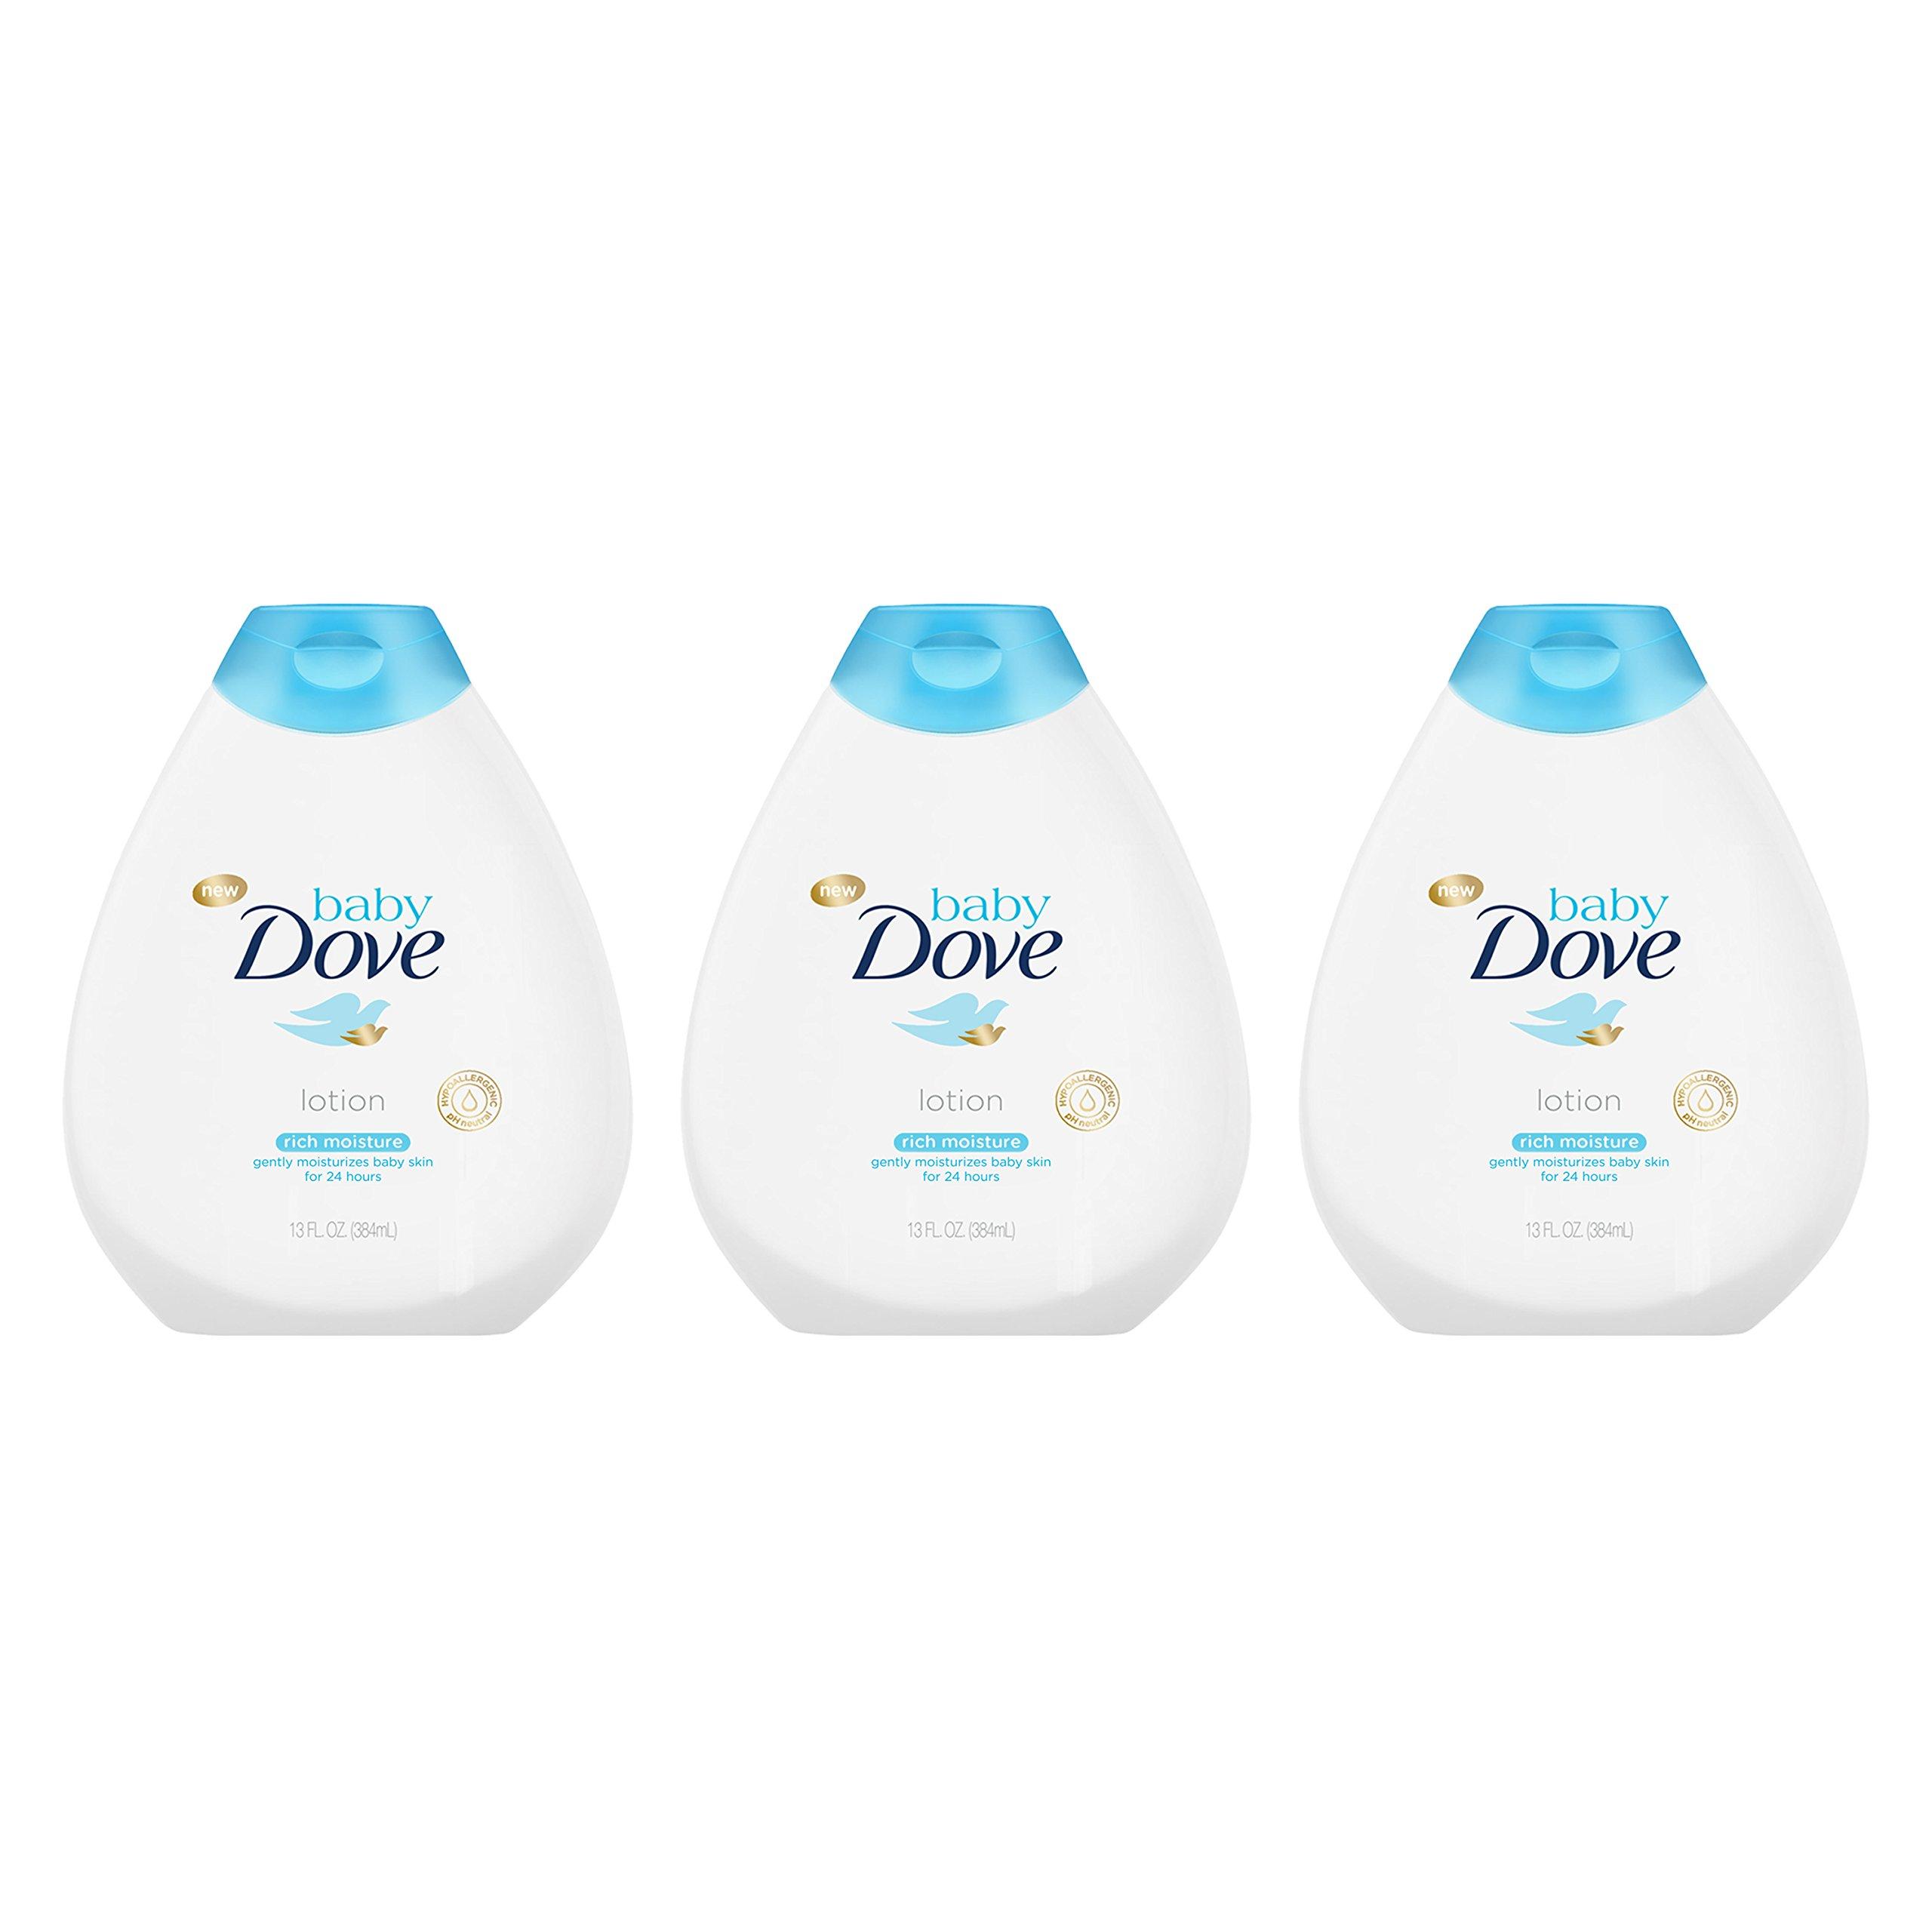 Baby Dove Lotion, Rich Moisture,13 oz, 3 Pack